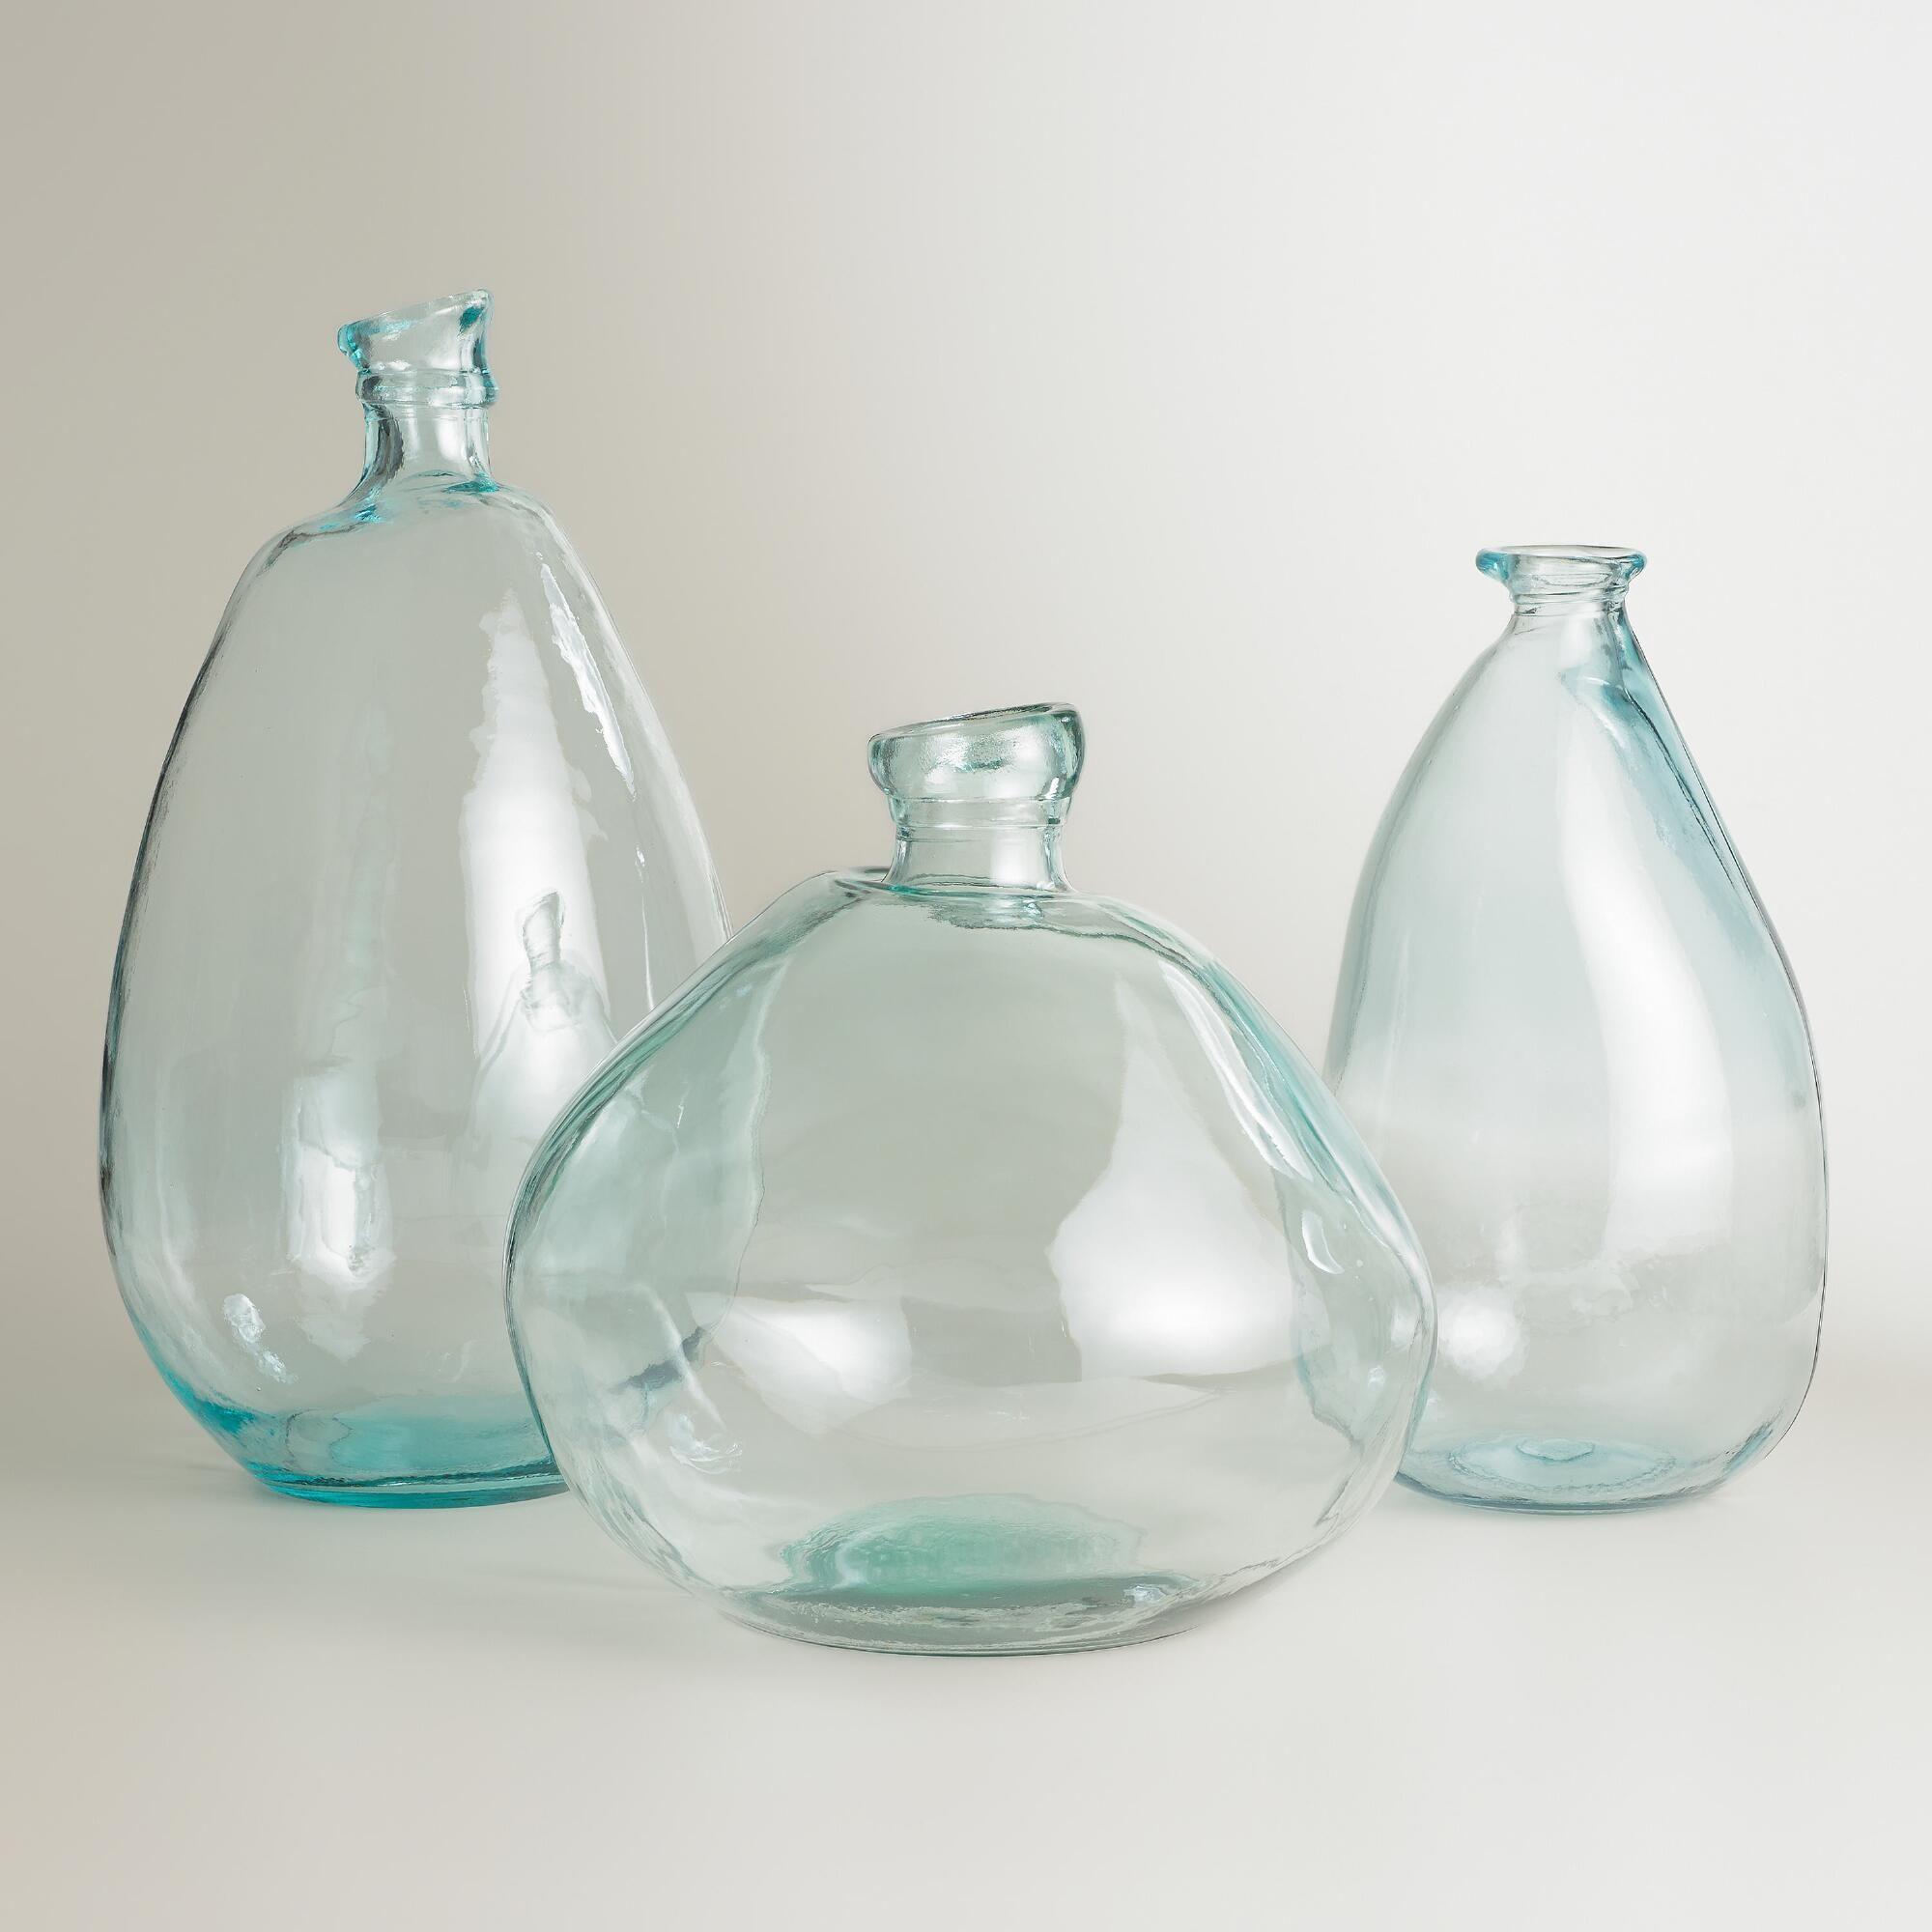 Clear Barcelona Vases Home Decor Sale Affordable Farmhouse Decor Recycled Glass Vases